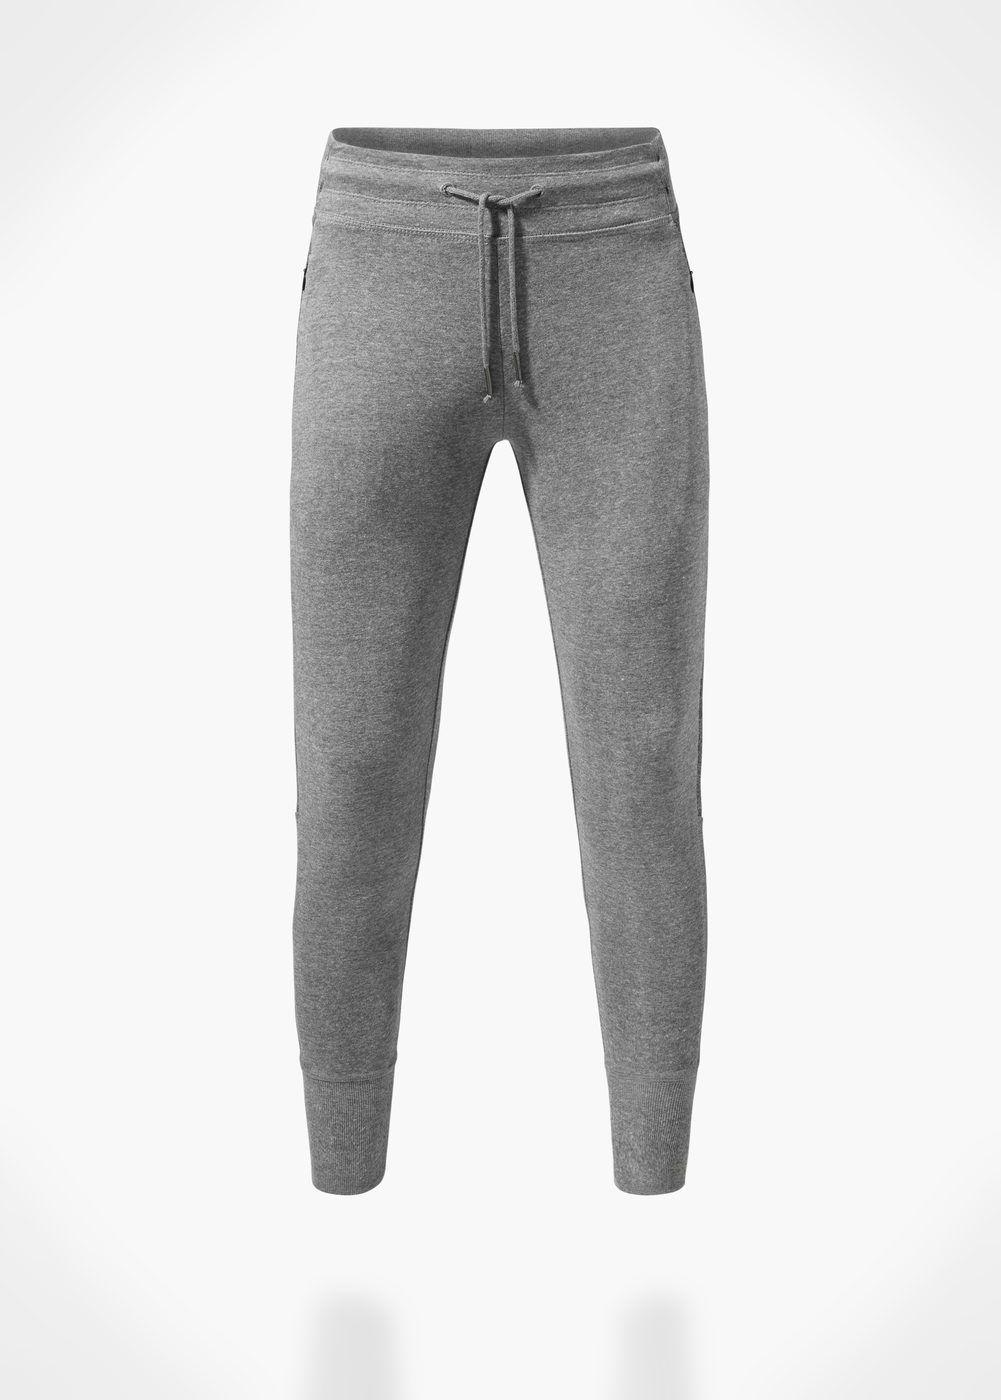 f3adc601a5f24 Pantalón jogging felpa - Mujer. Yoga - pantalón jogging felpa